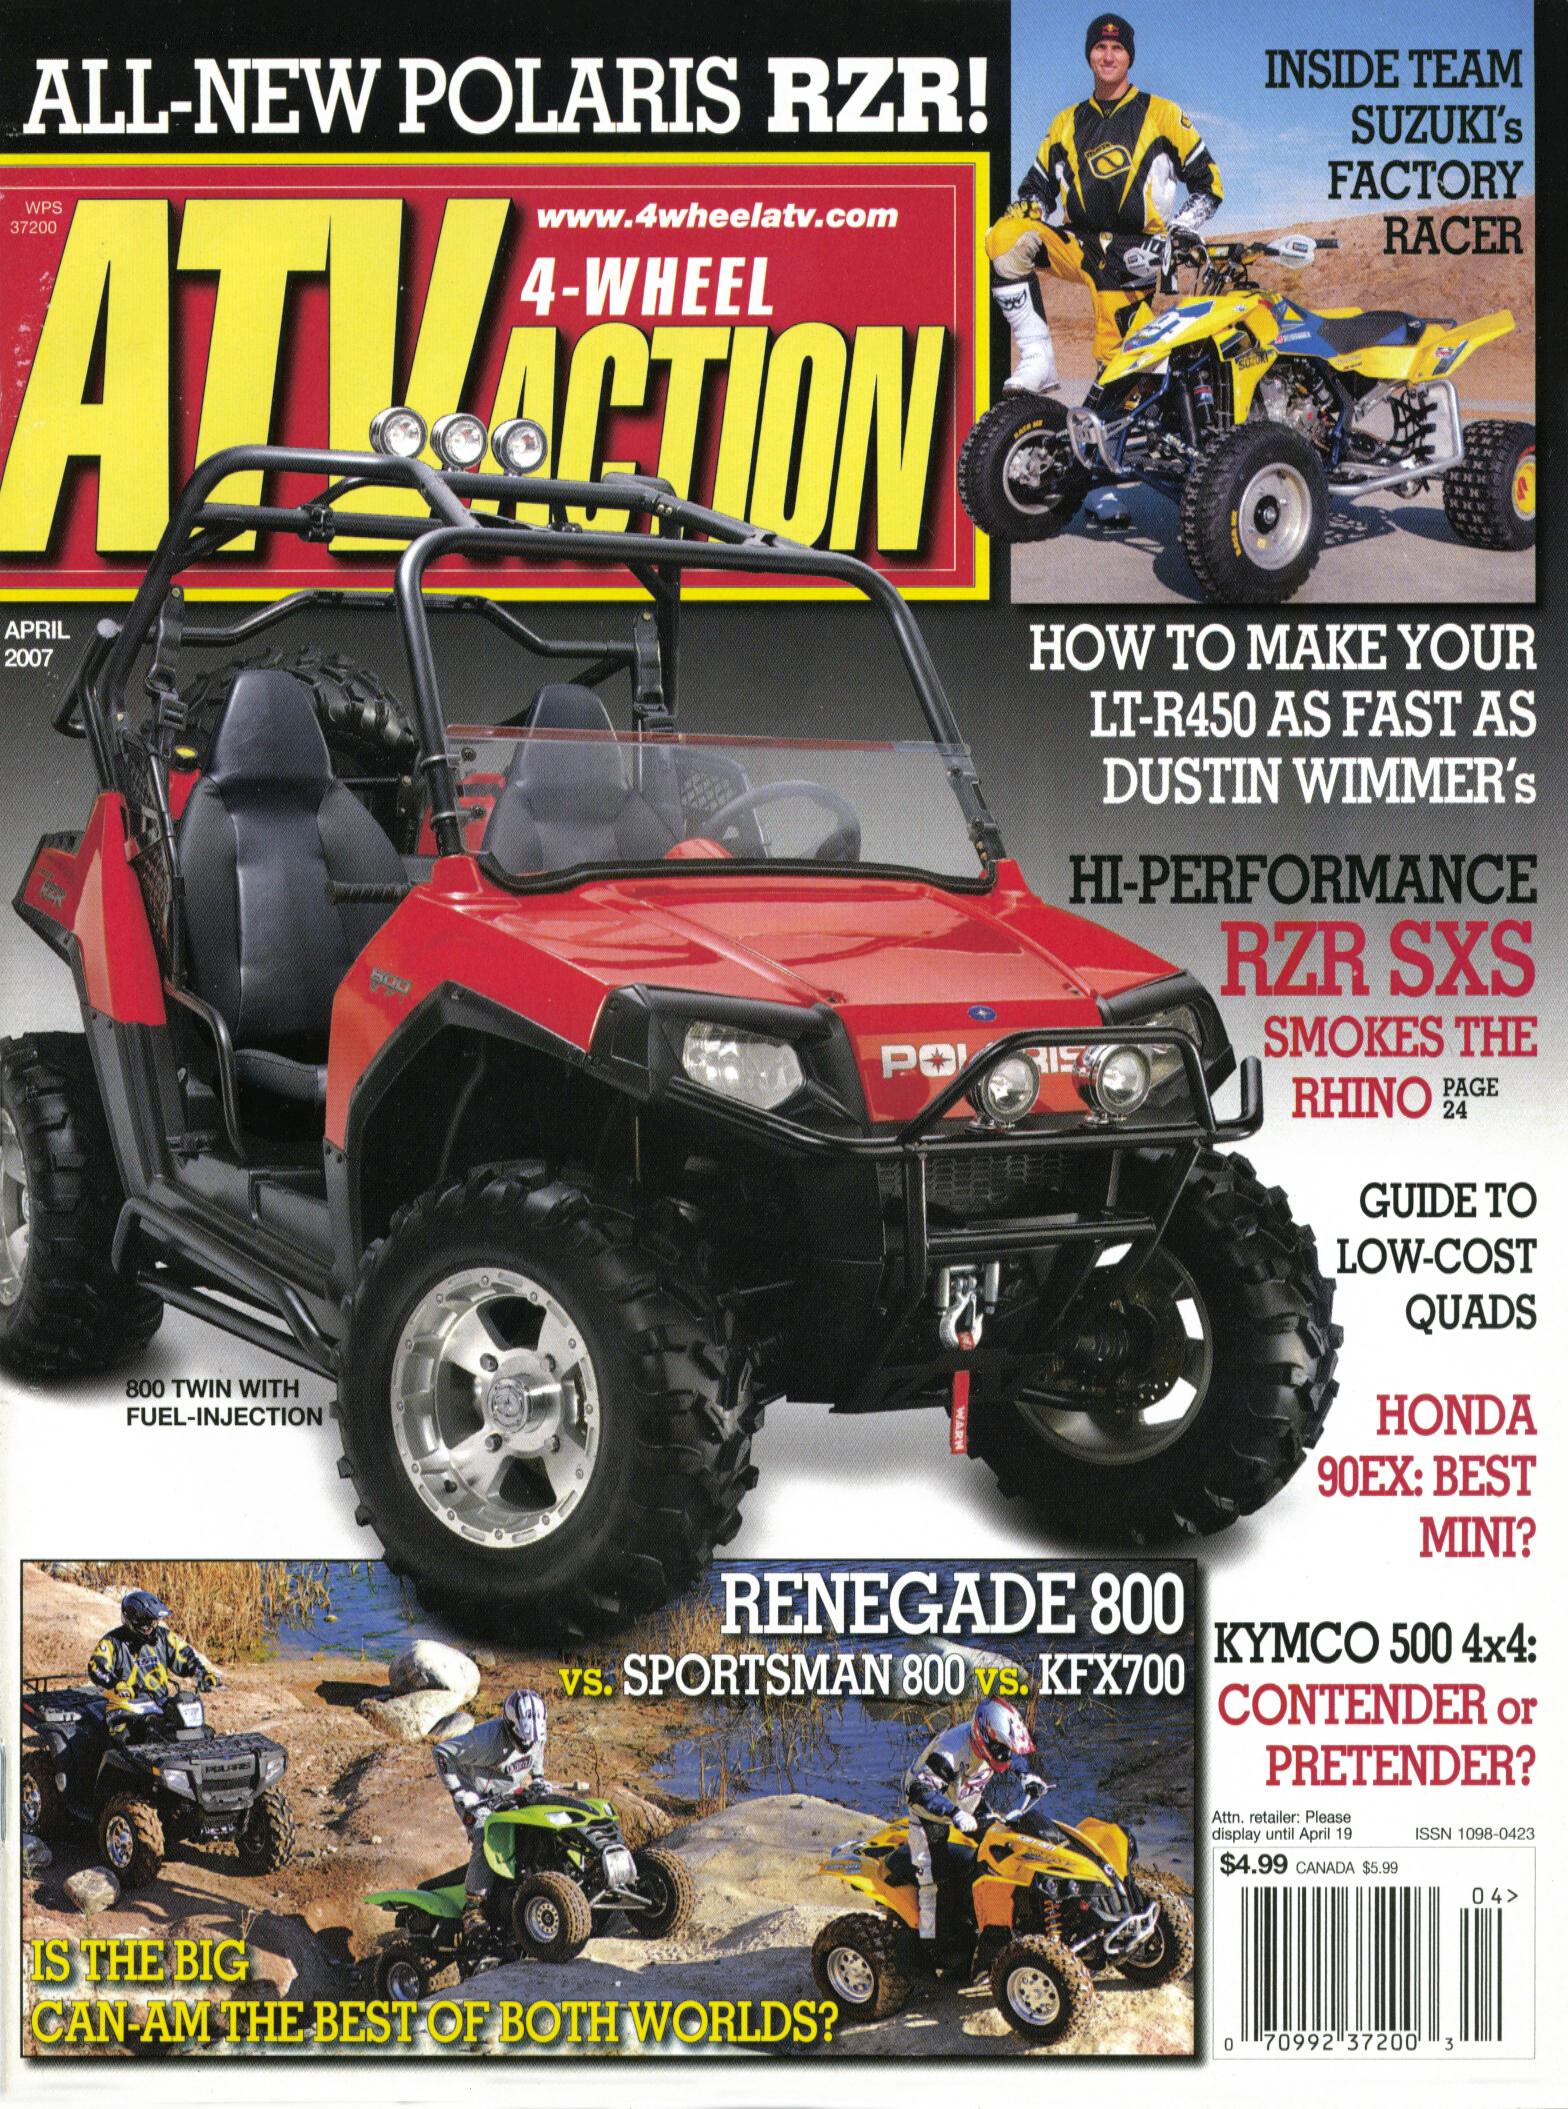 2019 Polaris Rzr Rumors >> FIRST POLARIS RZR TEST! 2008 RZR 800 | UTV Action Magazine